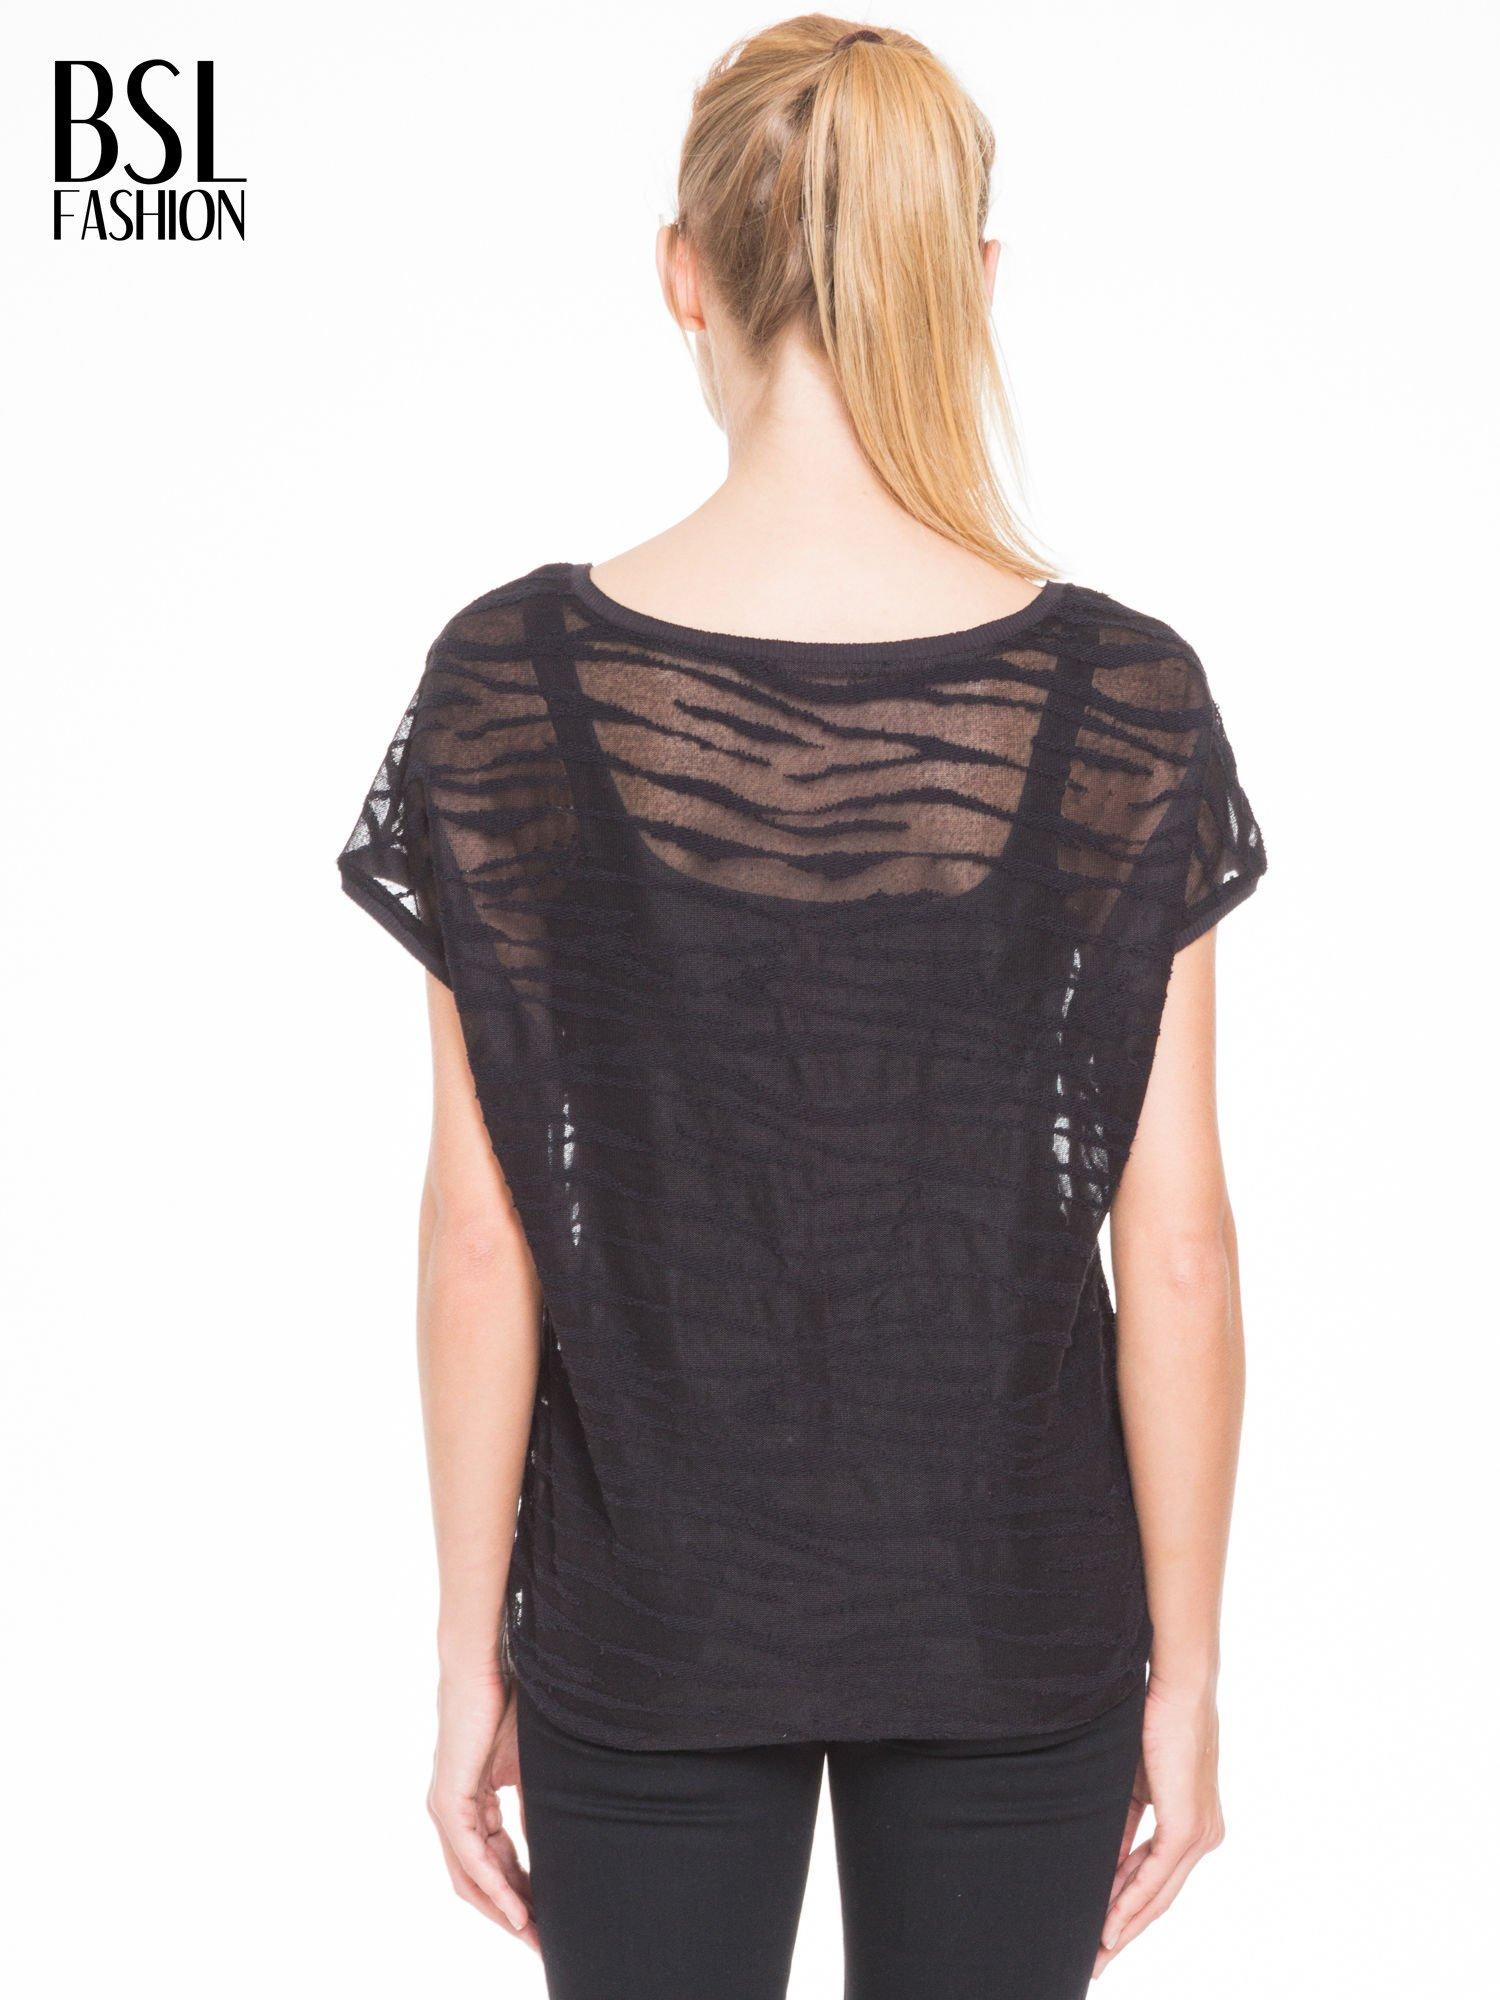 Czarny t-shirt mgiełka we wzór animal print                                  zdj.                                  4